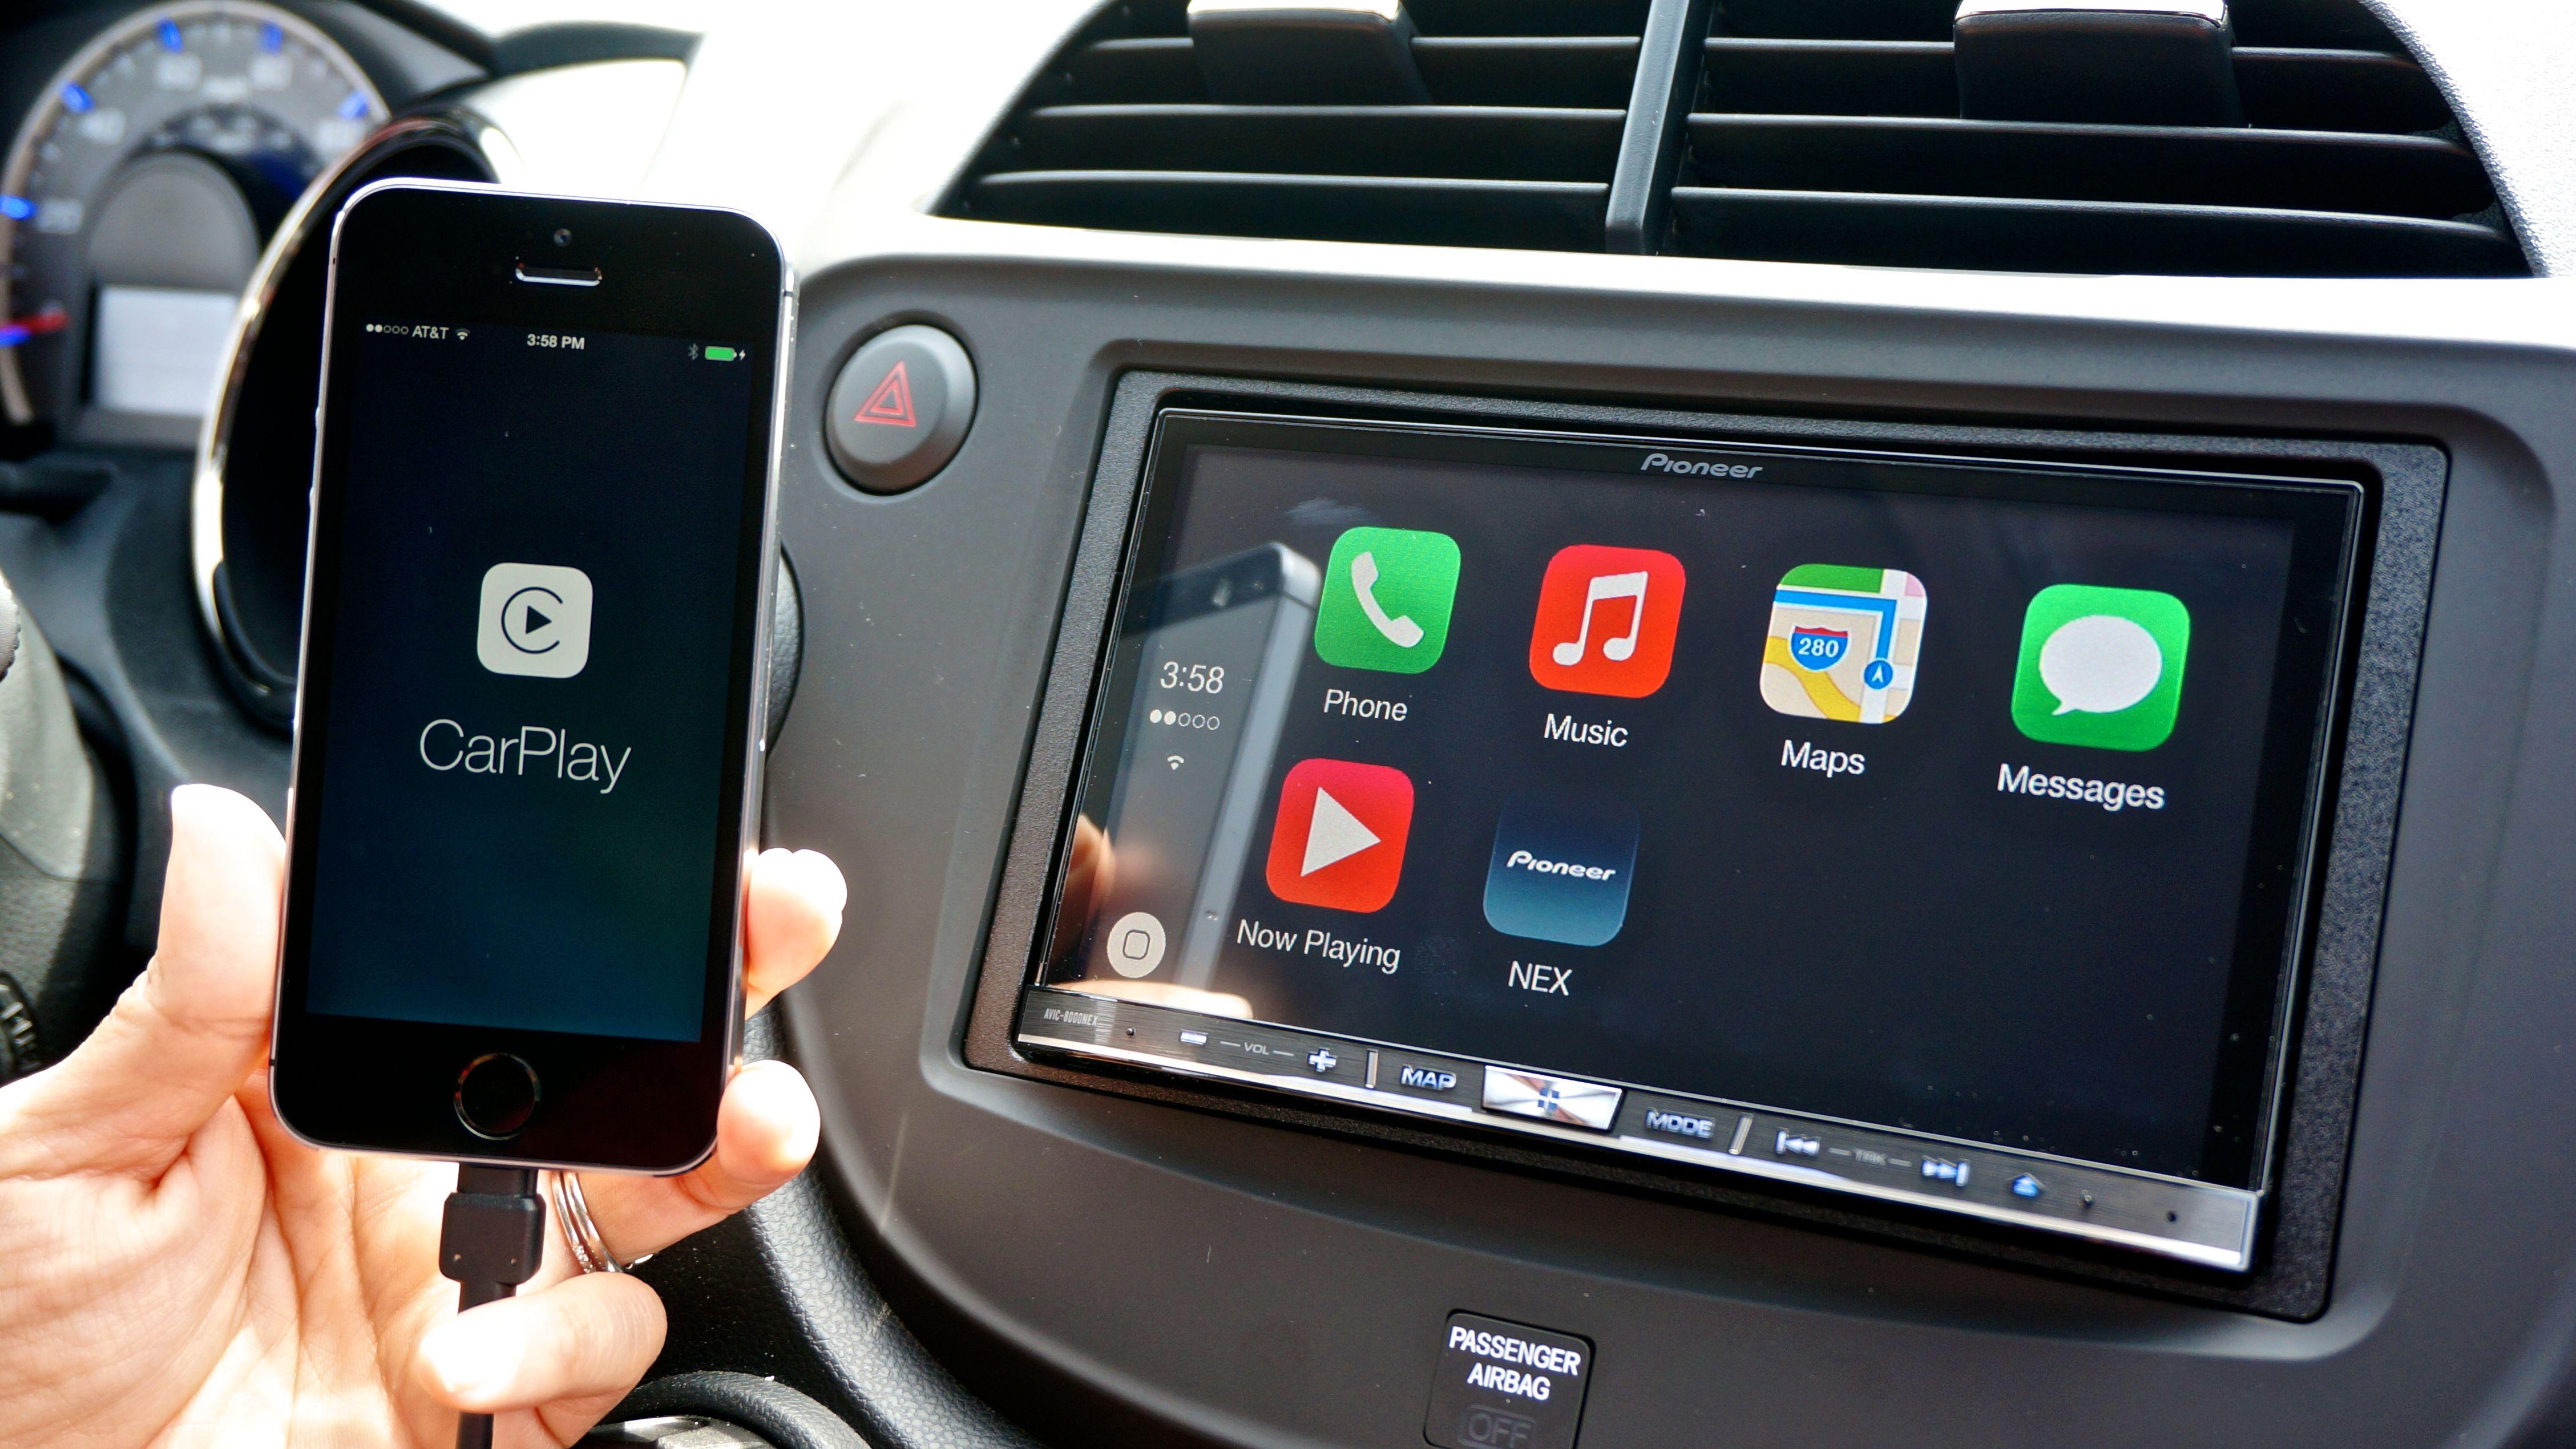 Will Apple Make A High Tech Self Driving Car? Apple car